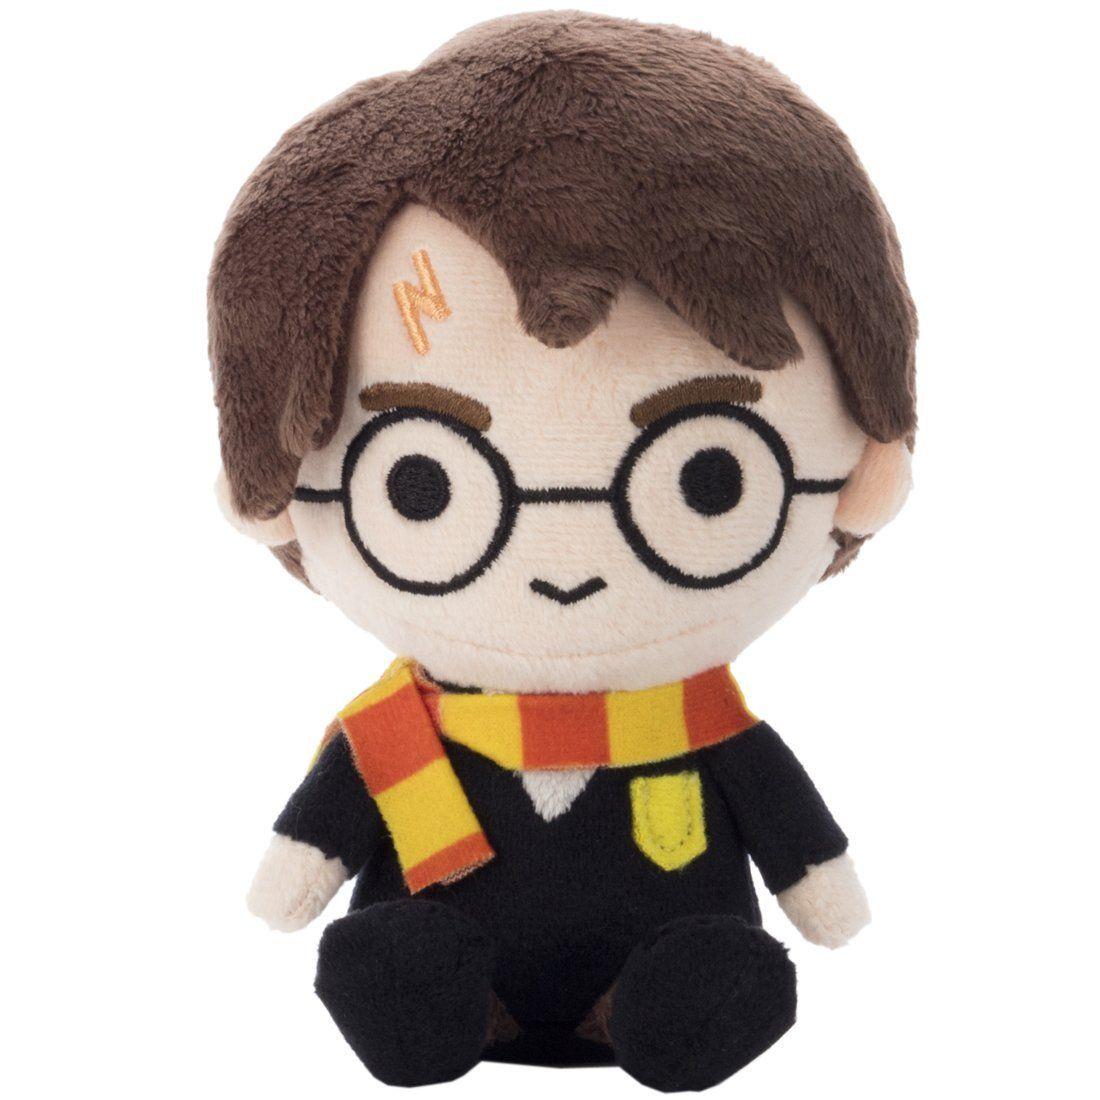 Kawaii Harry Potter Japan Exclusive Plushie Doll (13cm)